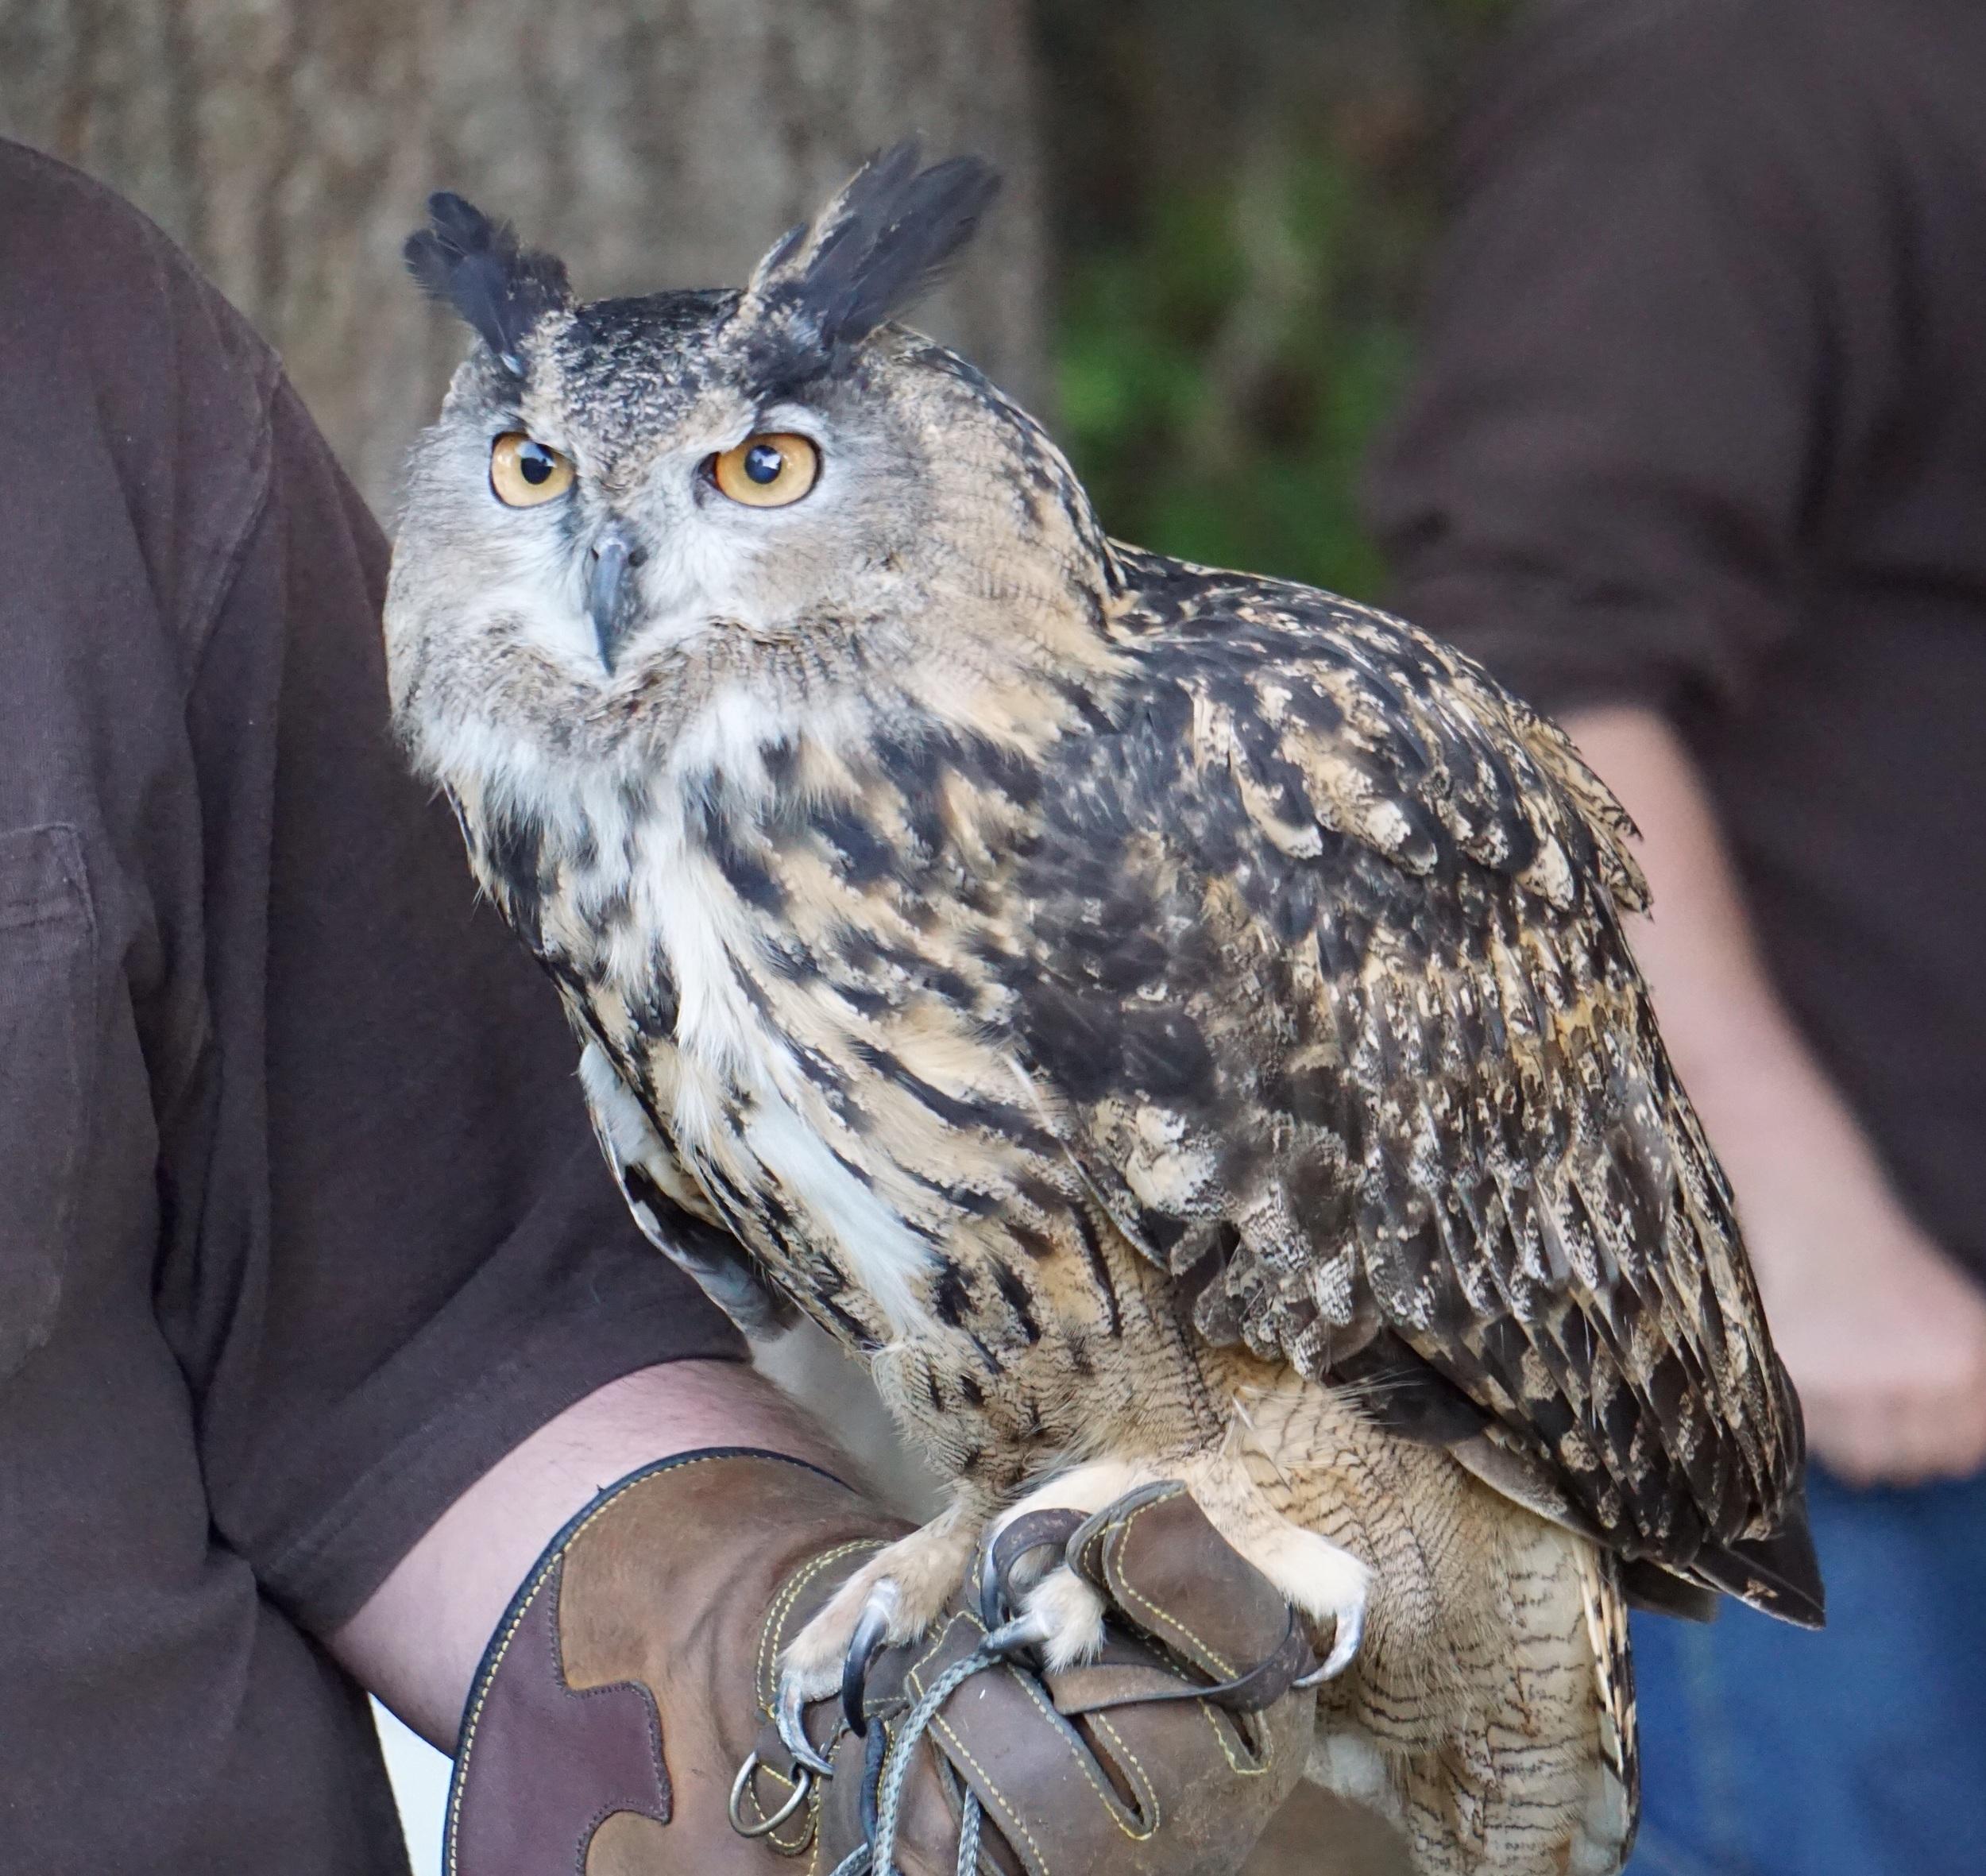 A Eurasian eagle-owl.